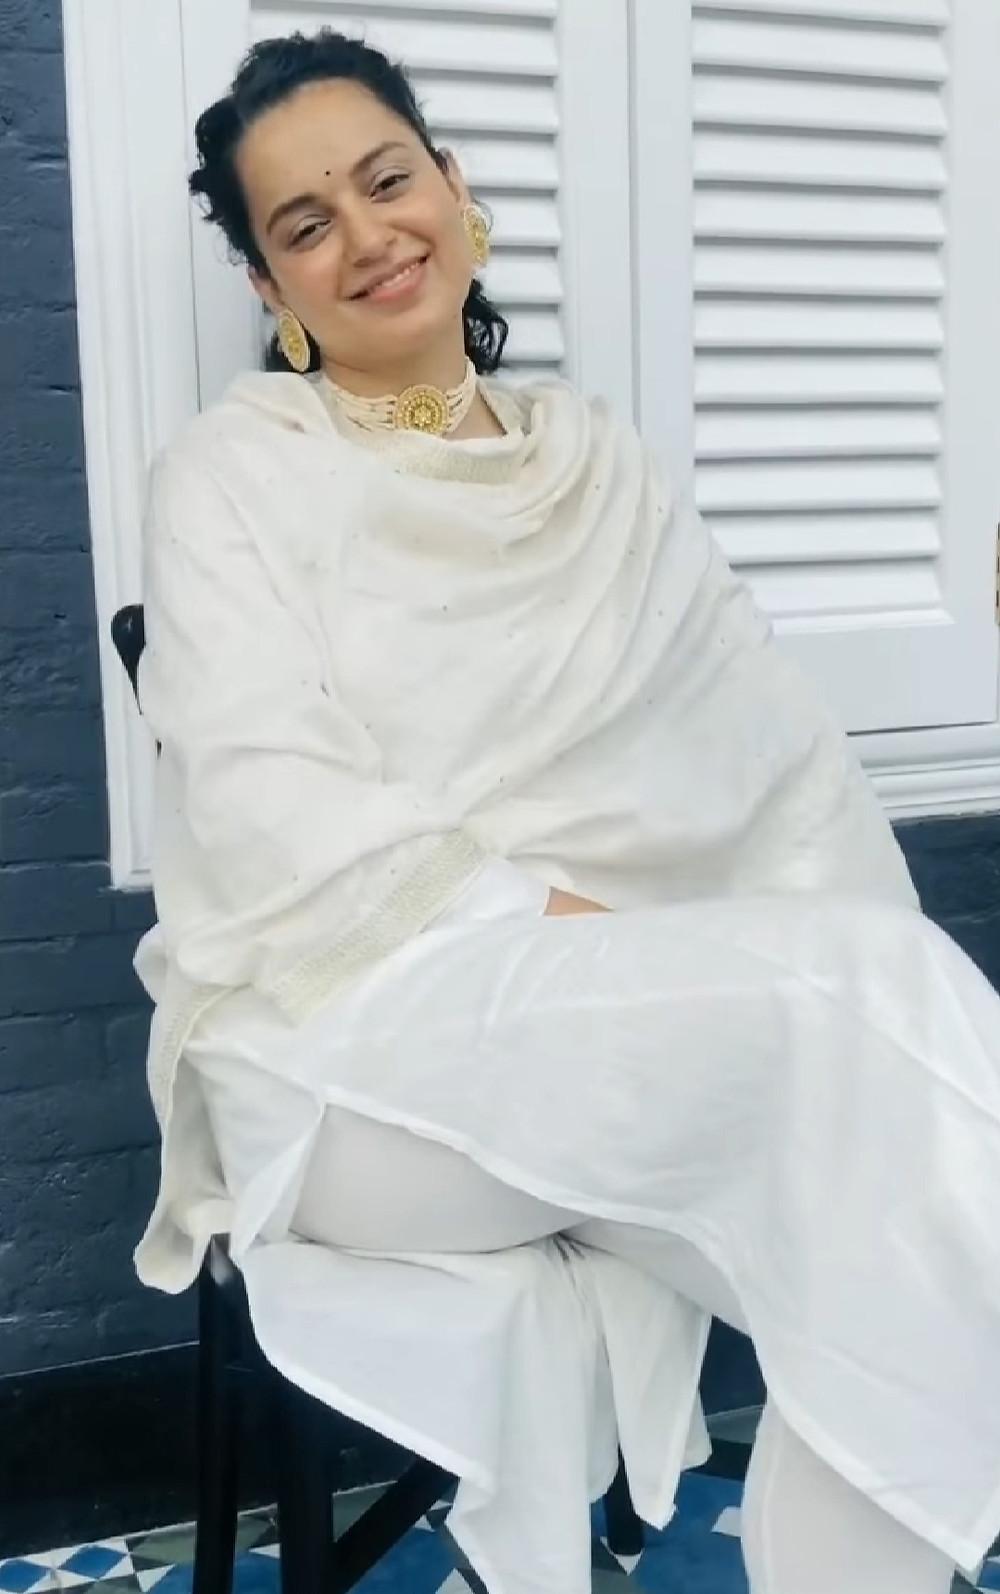 Kangana Ranaut - D Midas Touch Quarantine Routine